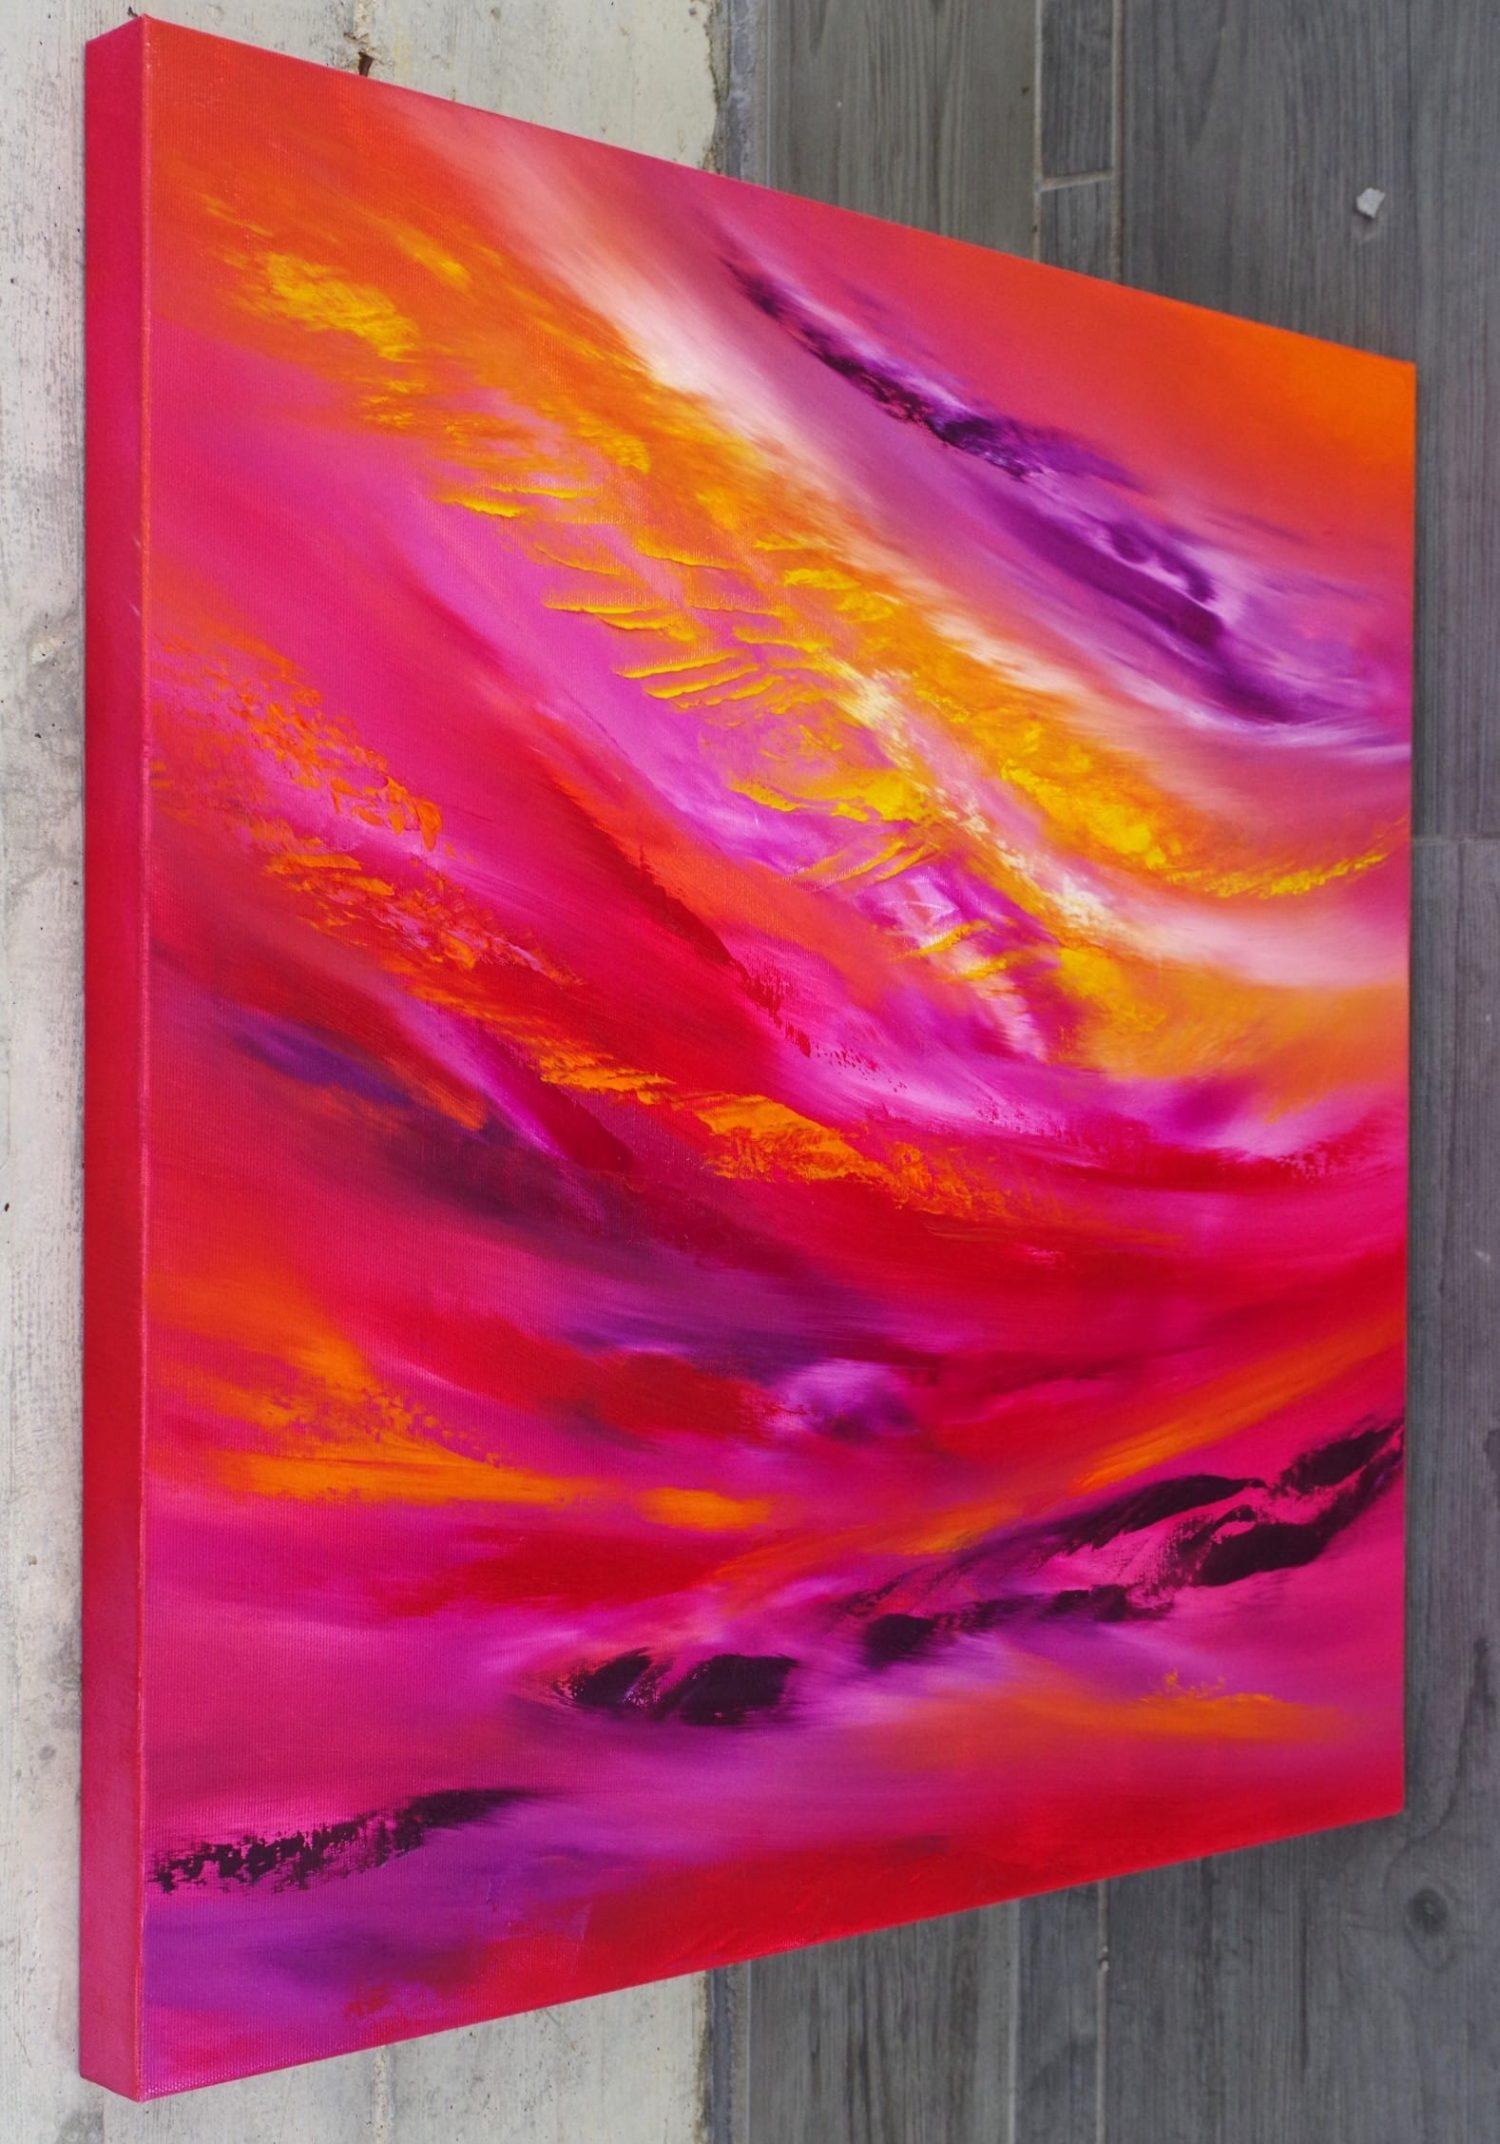 Sky element I dipinto originale in vendita online